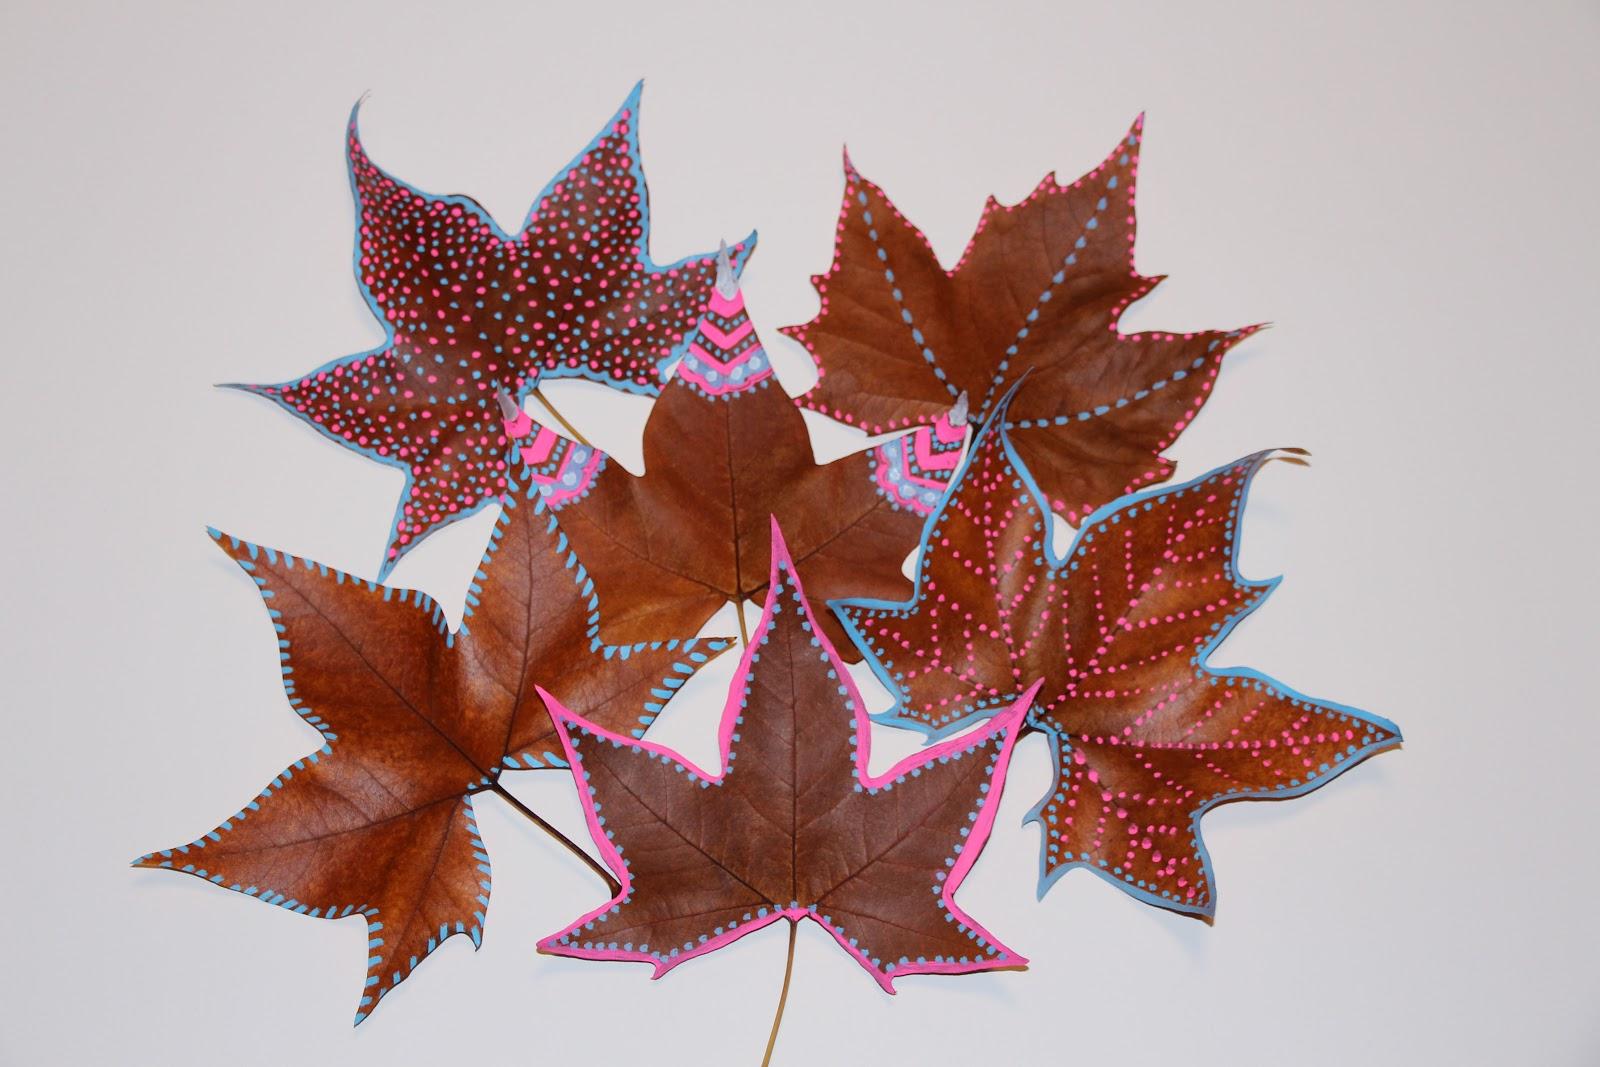 Mardefiesta hojas pintadas - Hojas de otono para decorar ...